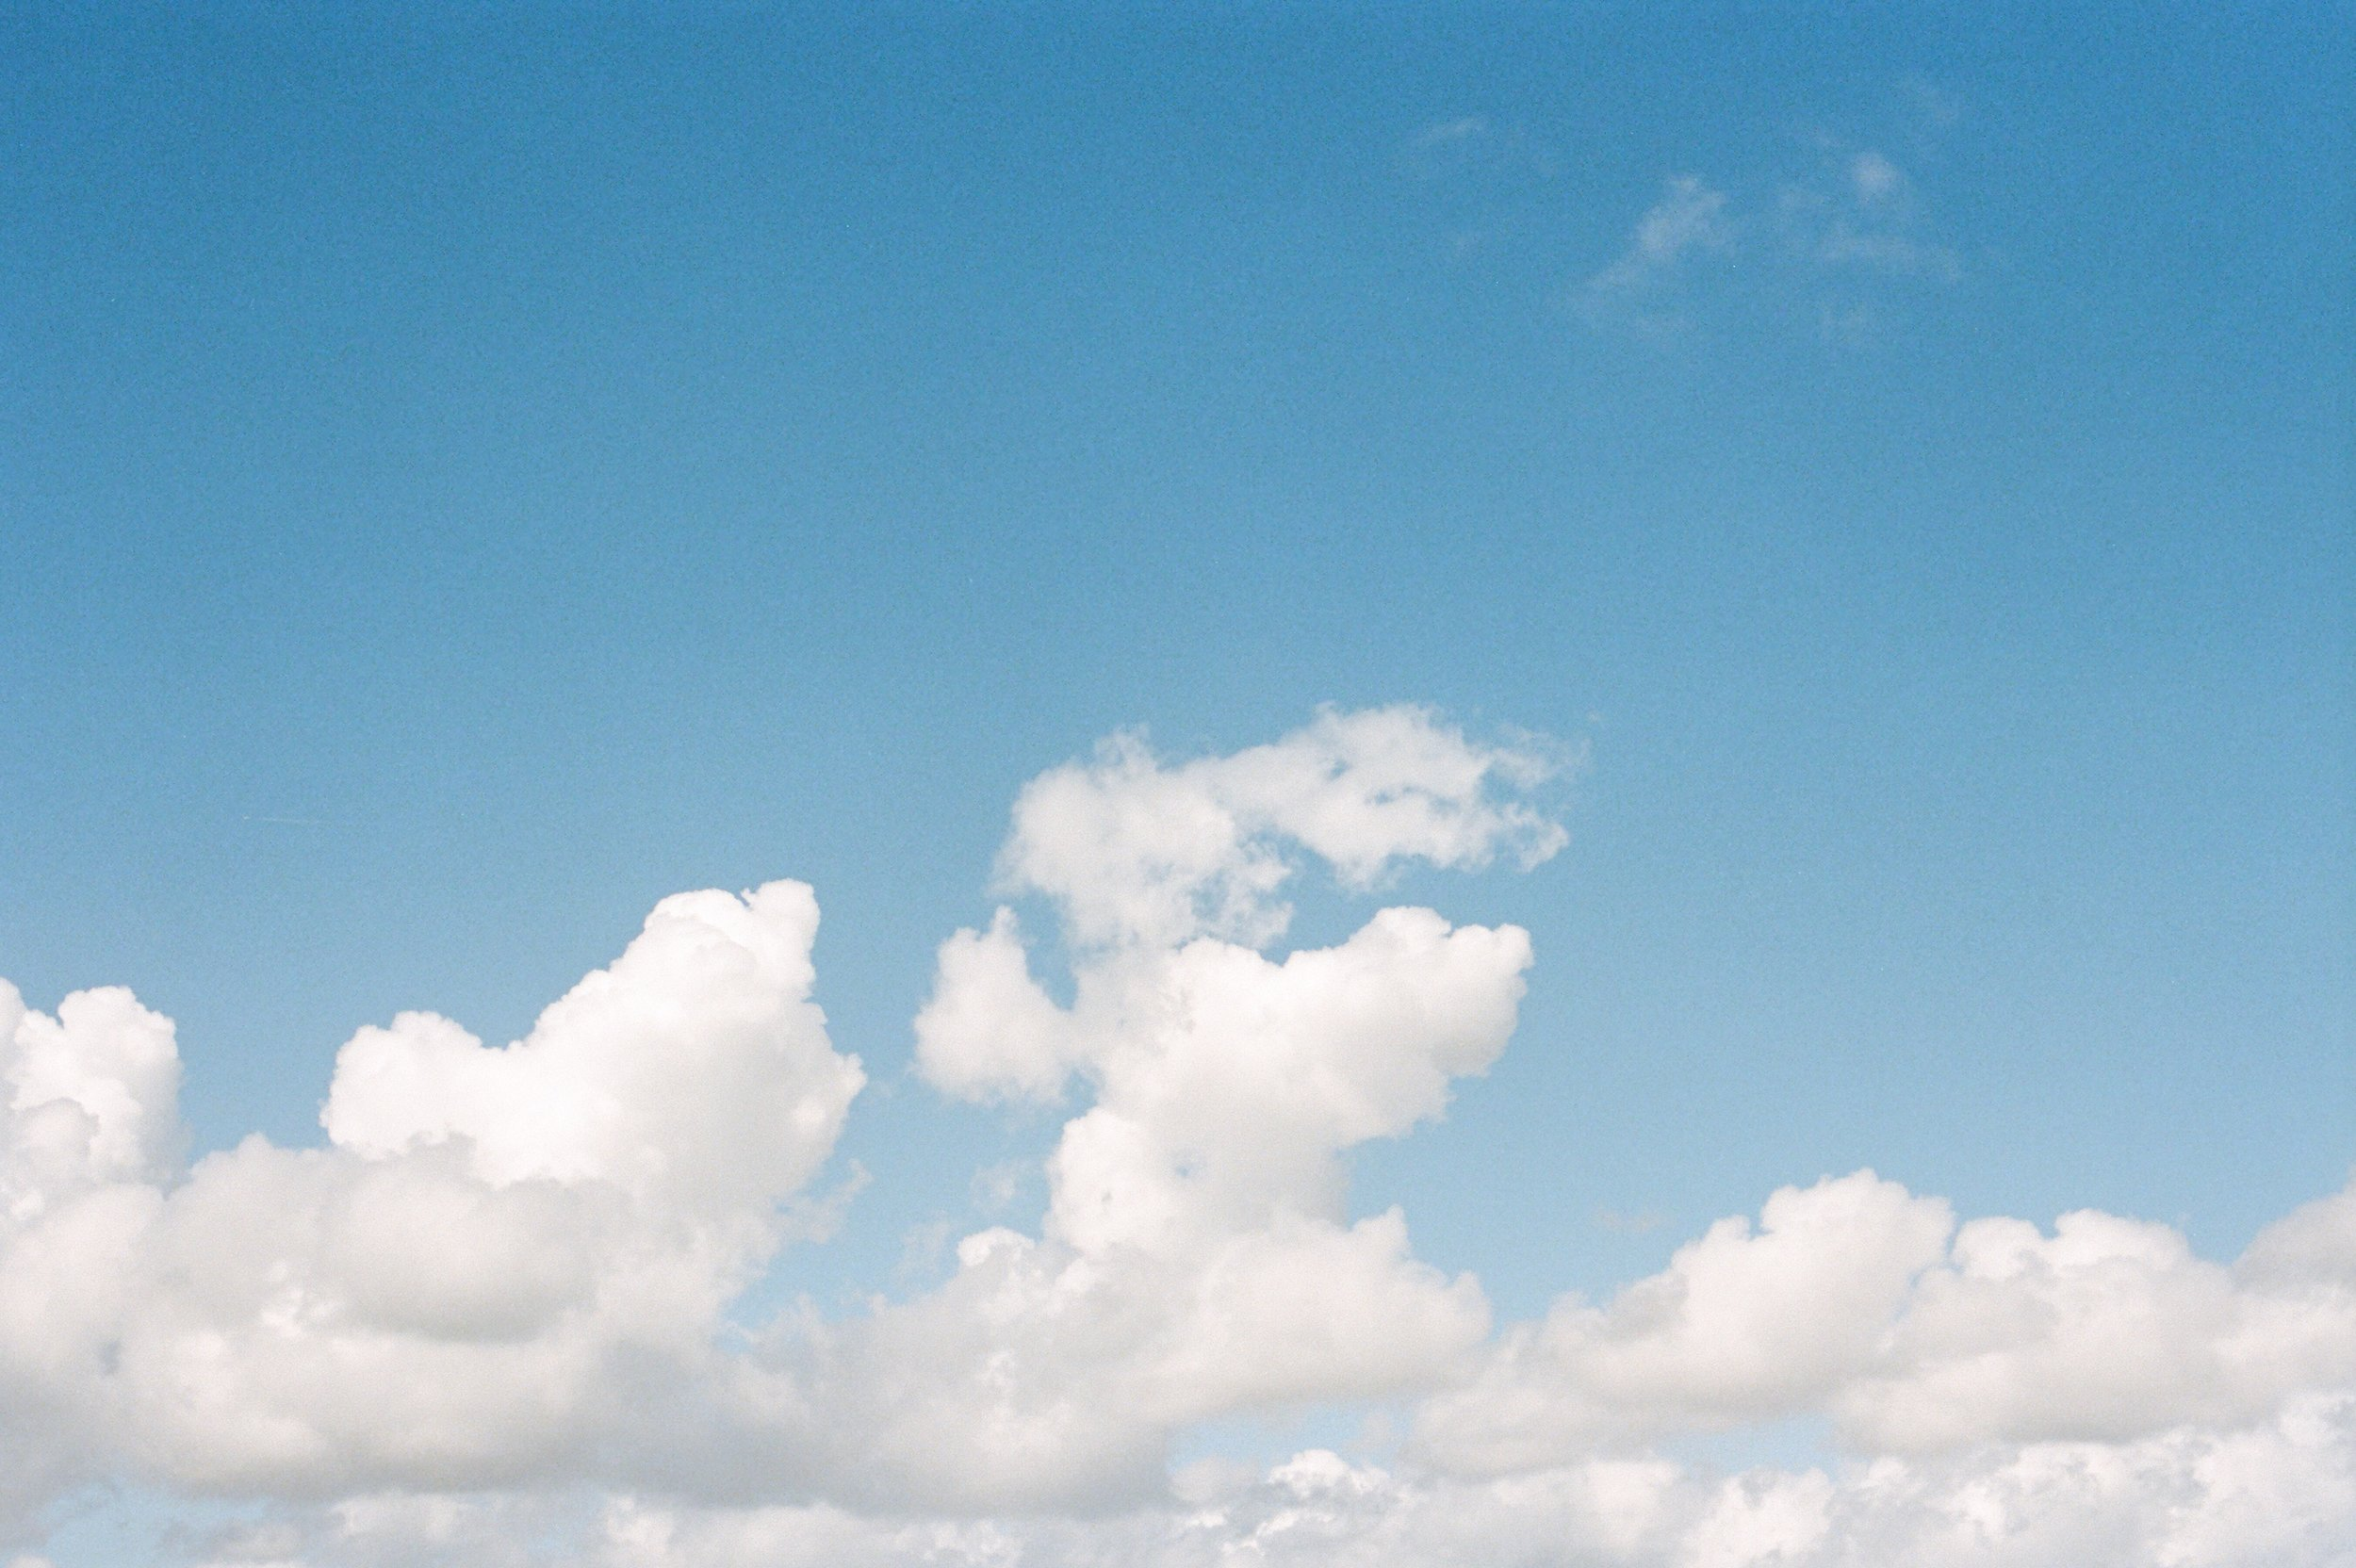 clouds_cloud_film_photographer_emily_walker_7.jpg